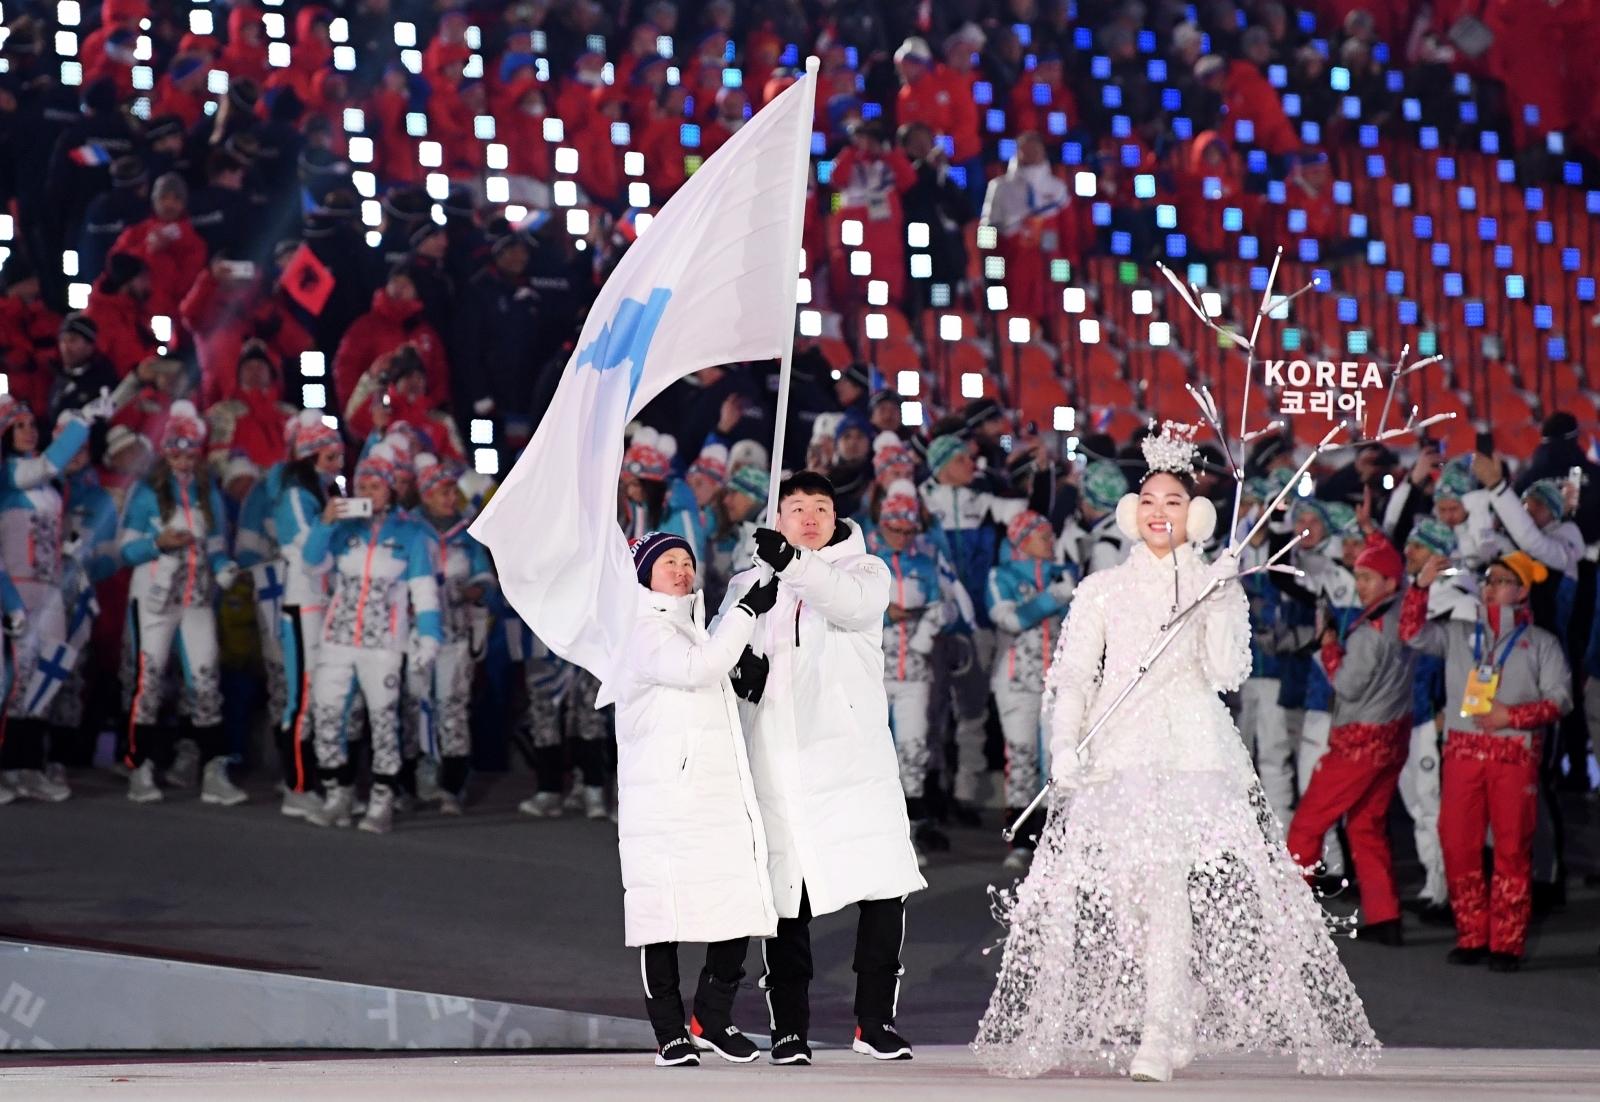 Unified Korean flag